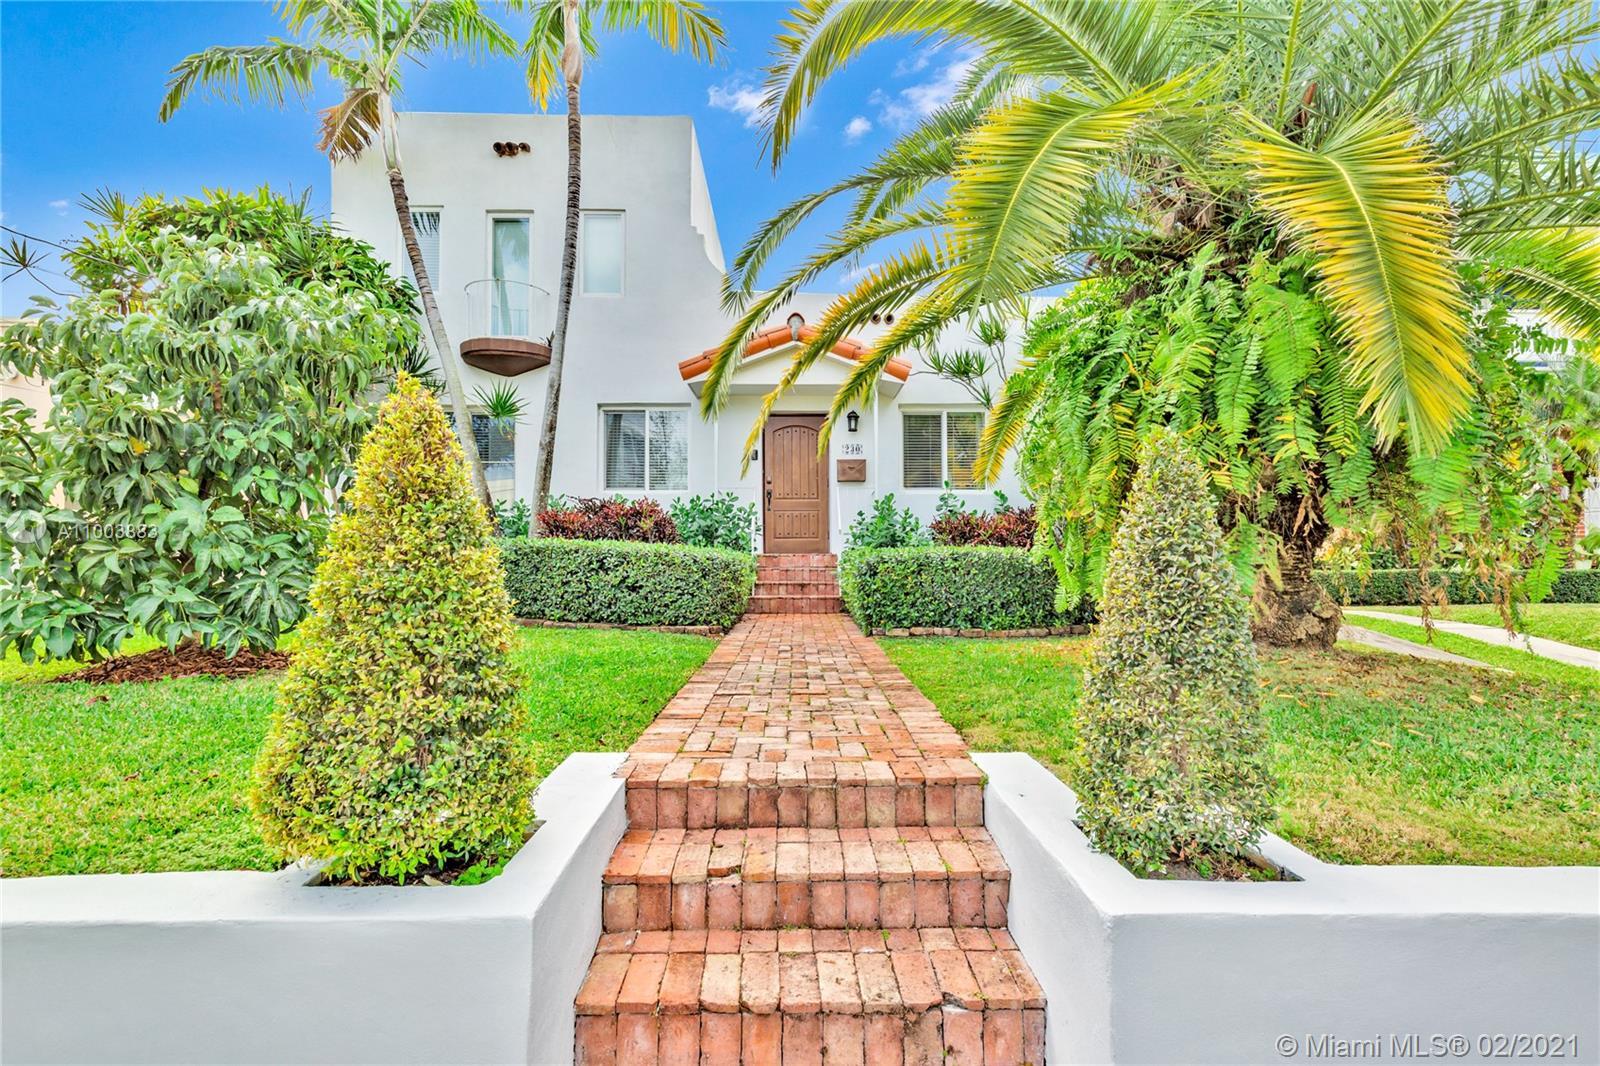 Holleman Park - 230 SW 21st Rd, Miami, FL 33129